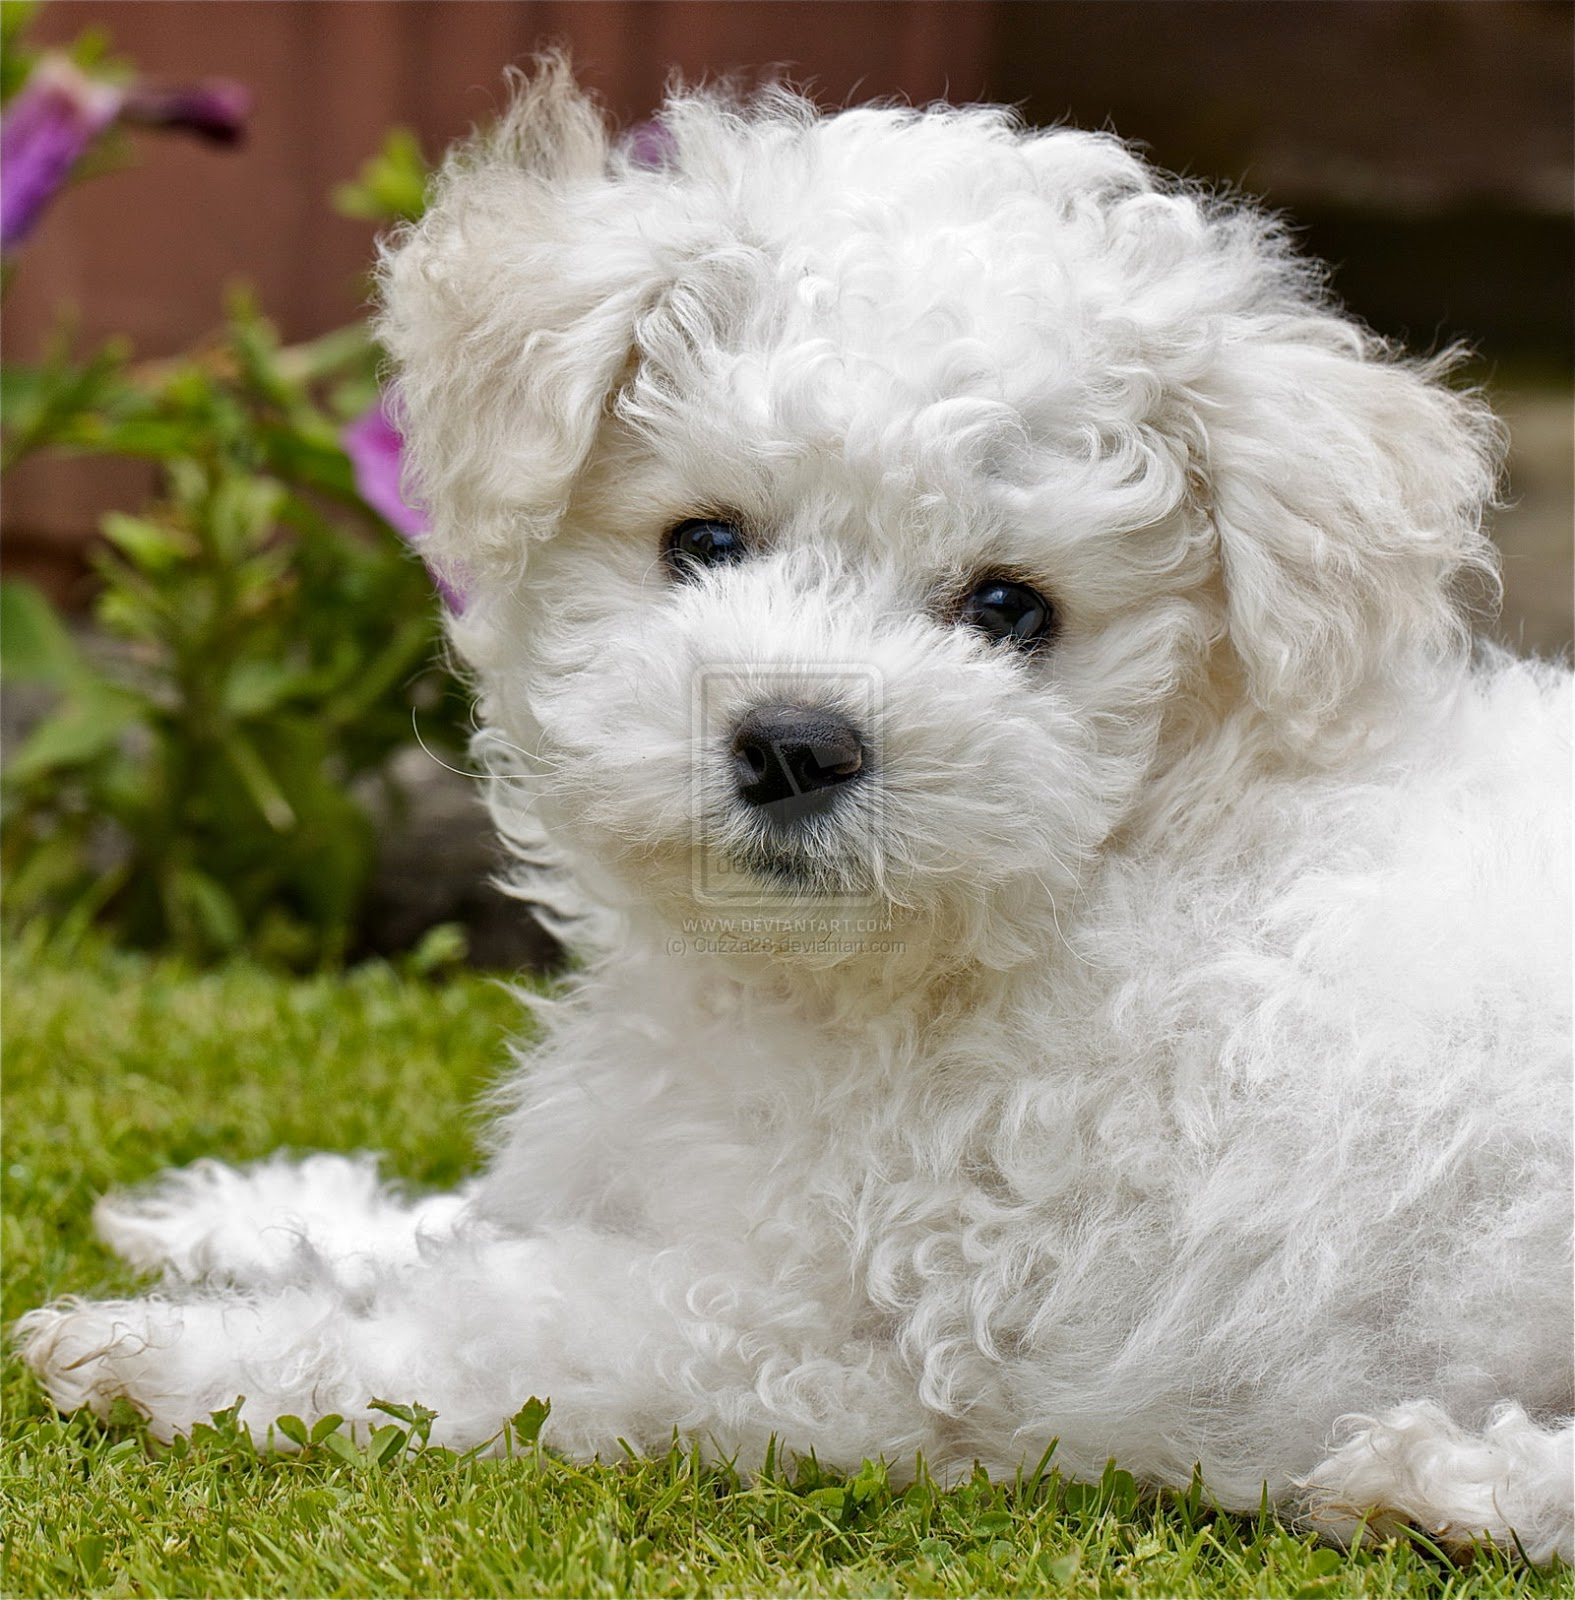 rules of the jungle bichon frise puppies cute puppy dog clipart cute puppy clip art